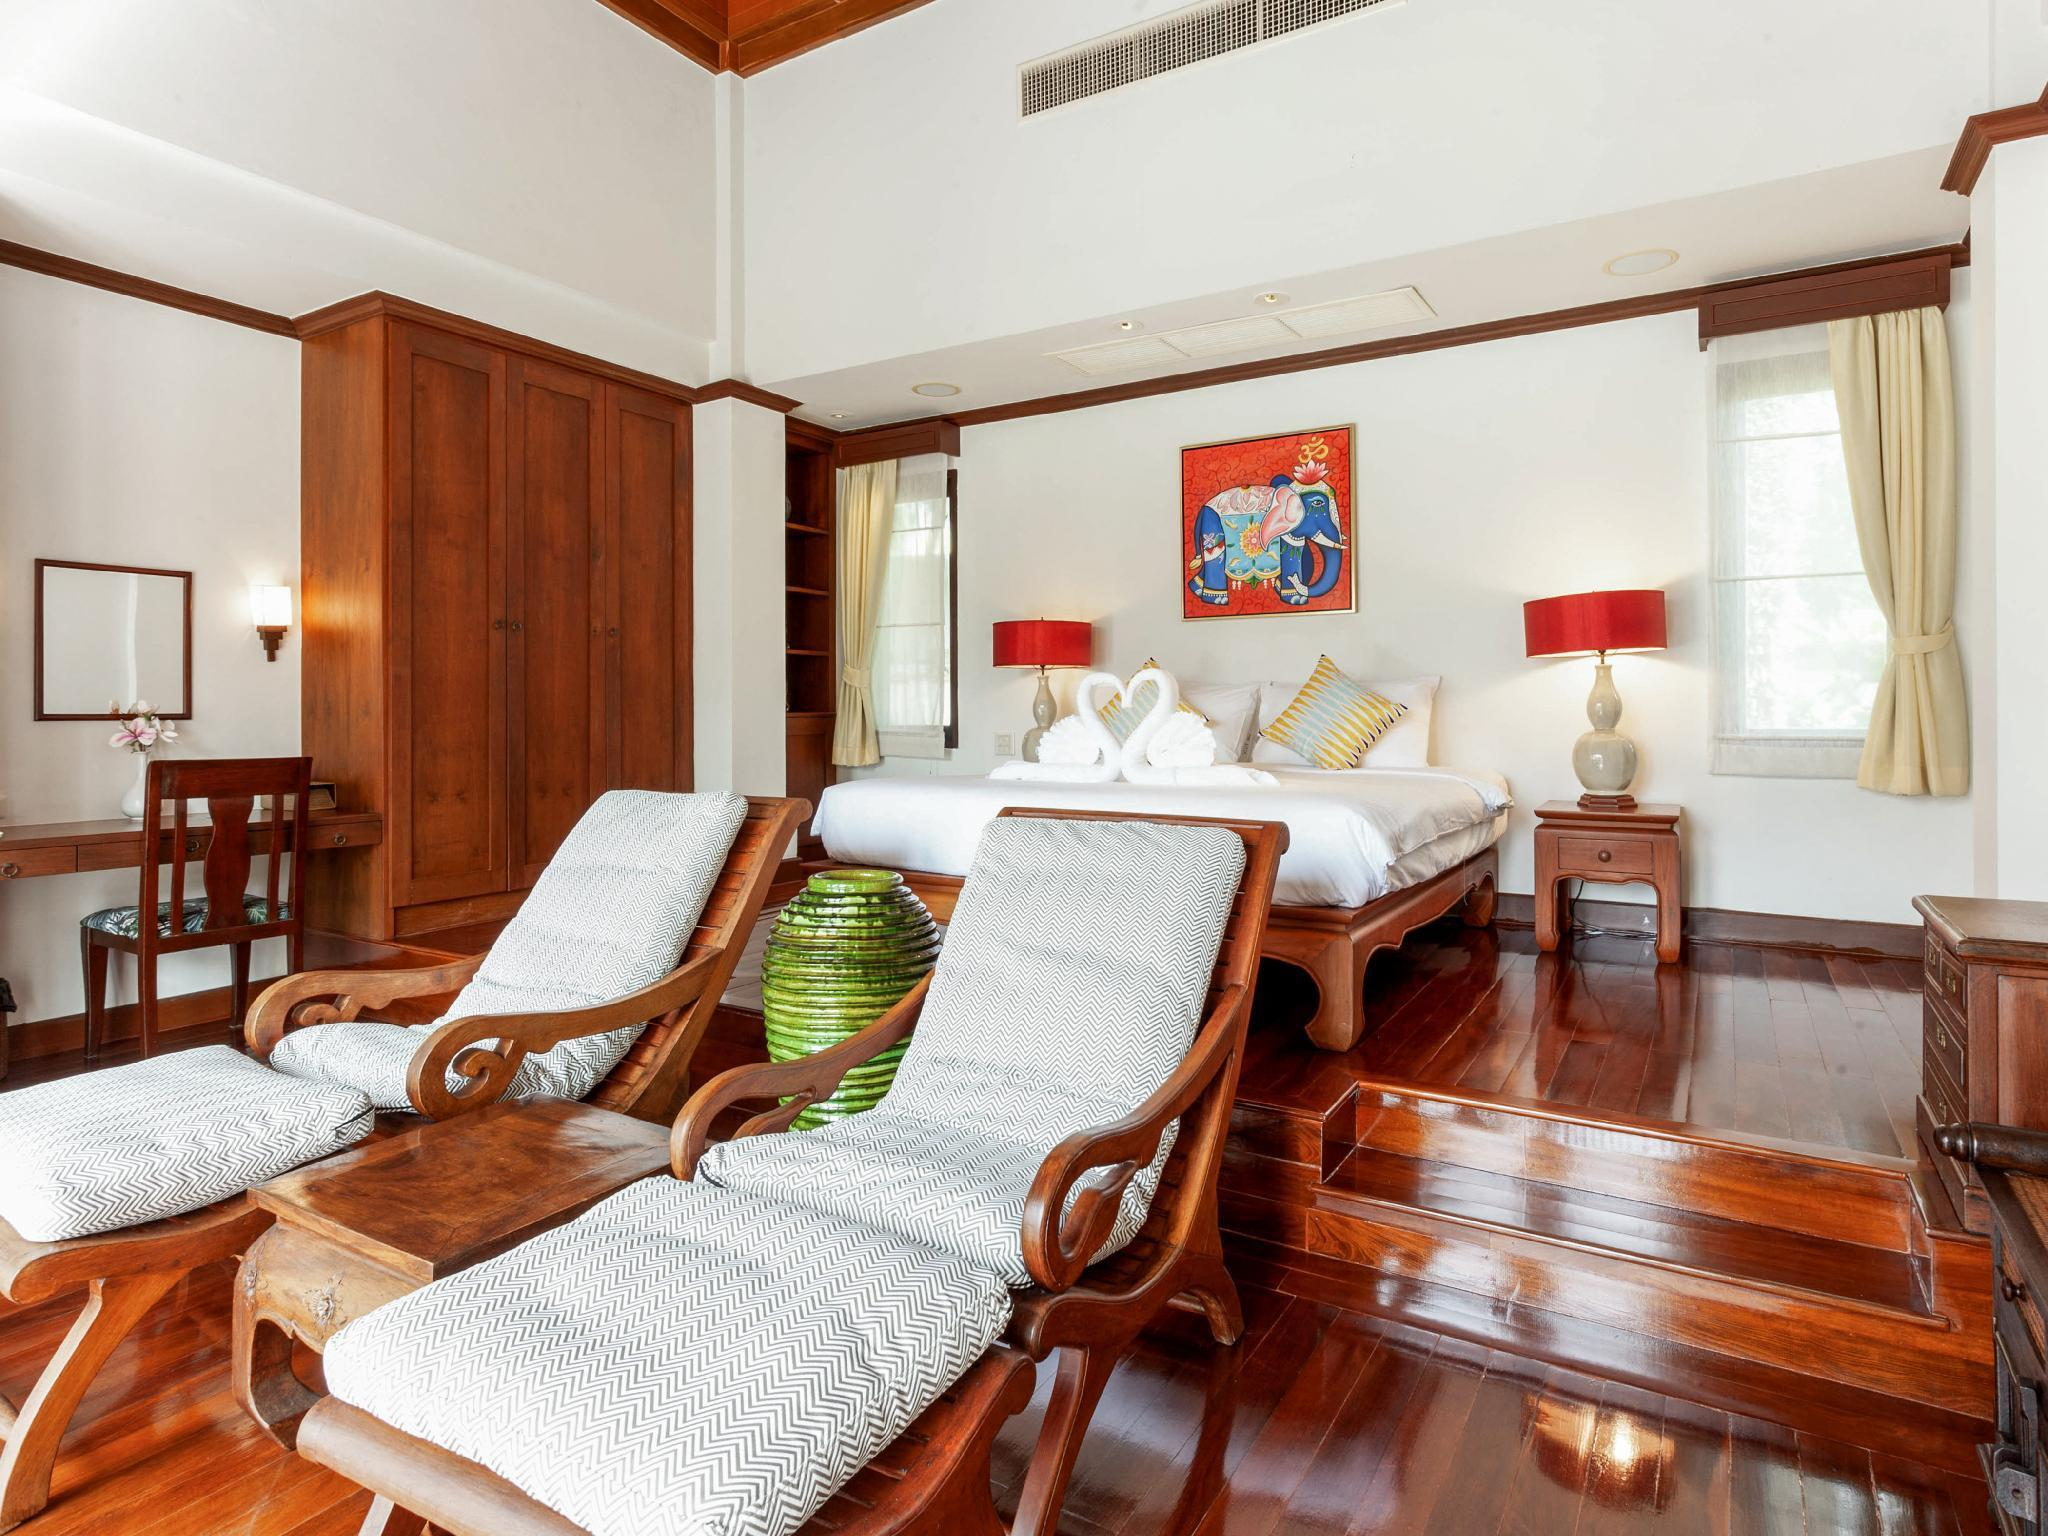 Bang tao luxury 4 bedrooms pool villa(LAN Villa) วิลลา 4 ห้องนอน 4 ห้องน้ำส่วนตัว ขนาด 800 ตร.ม. – บางเทา